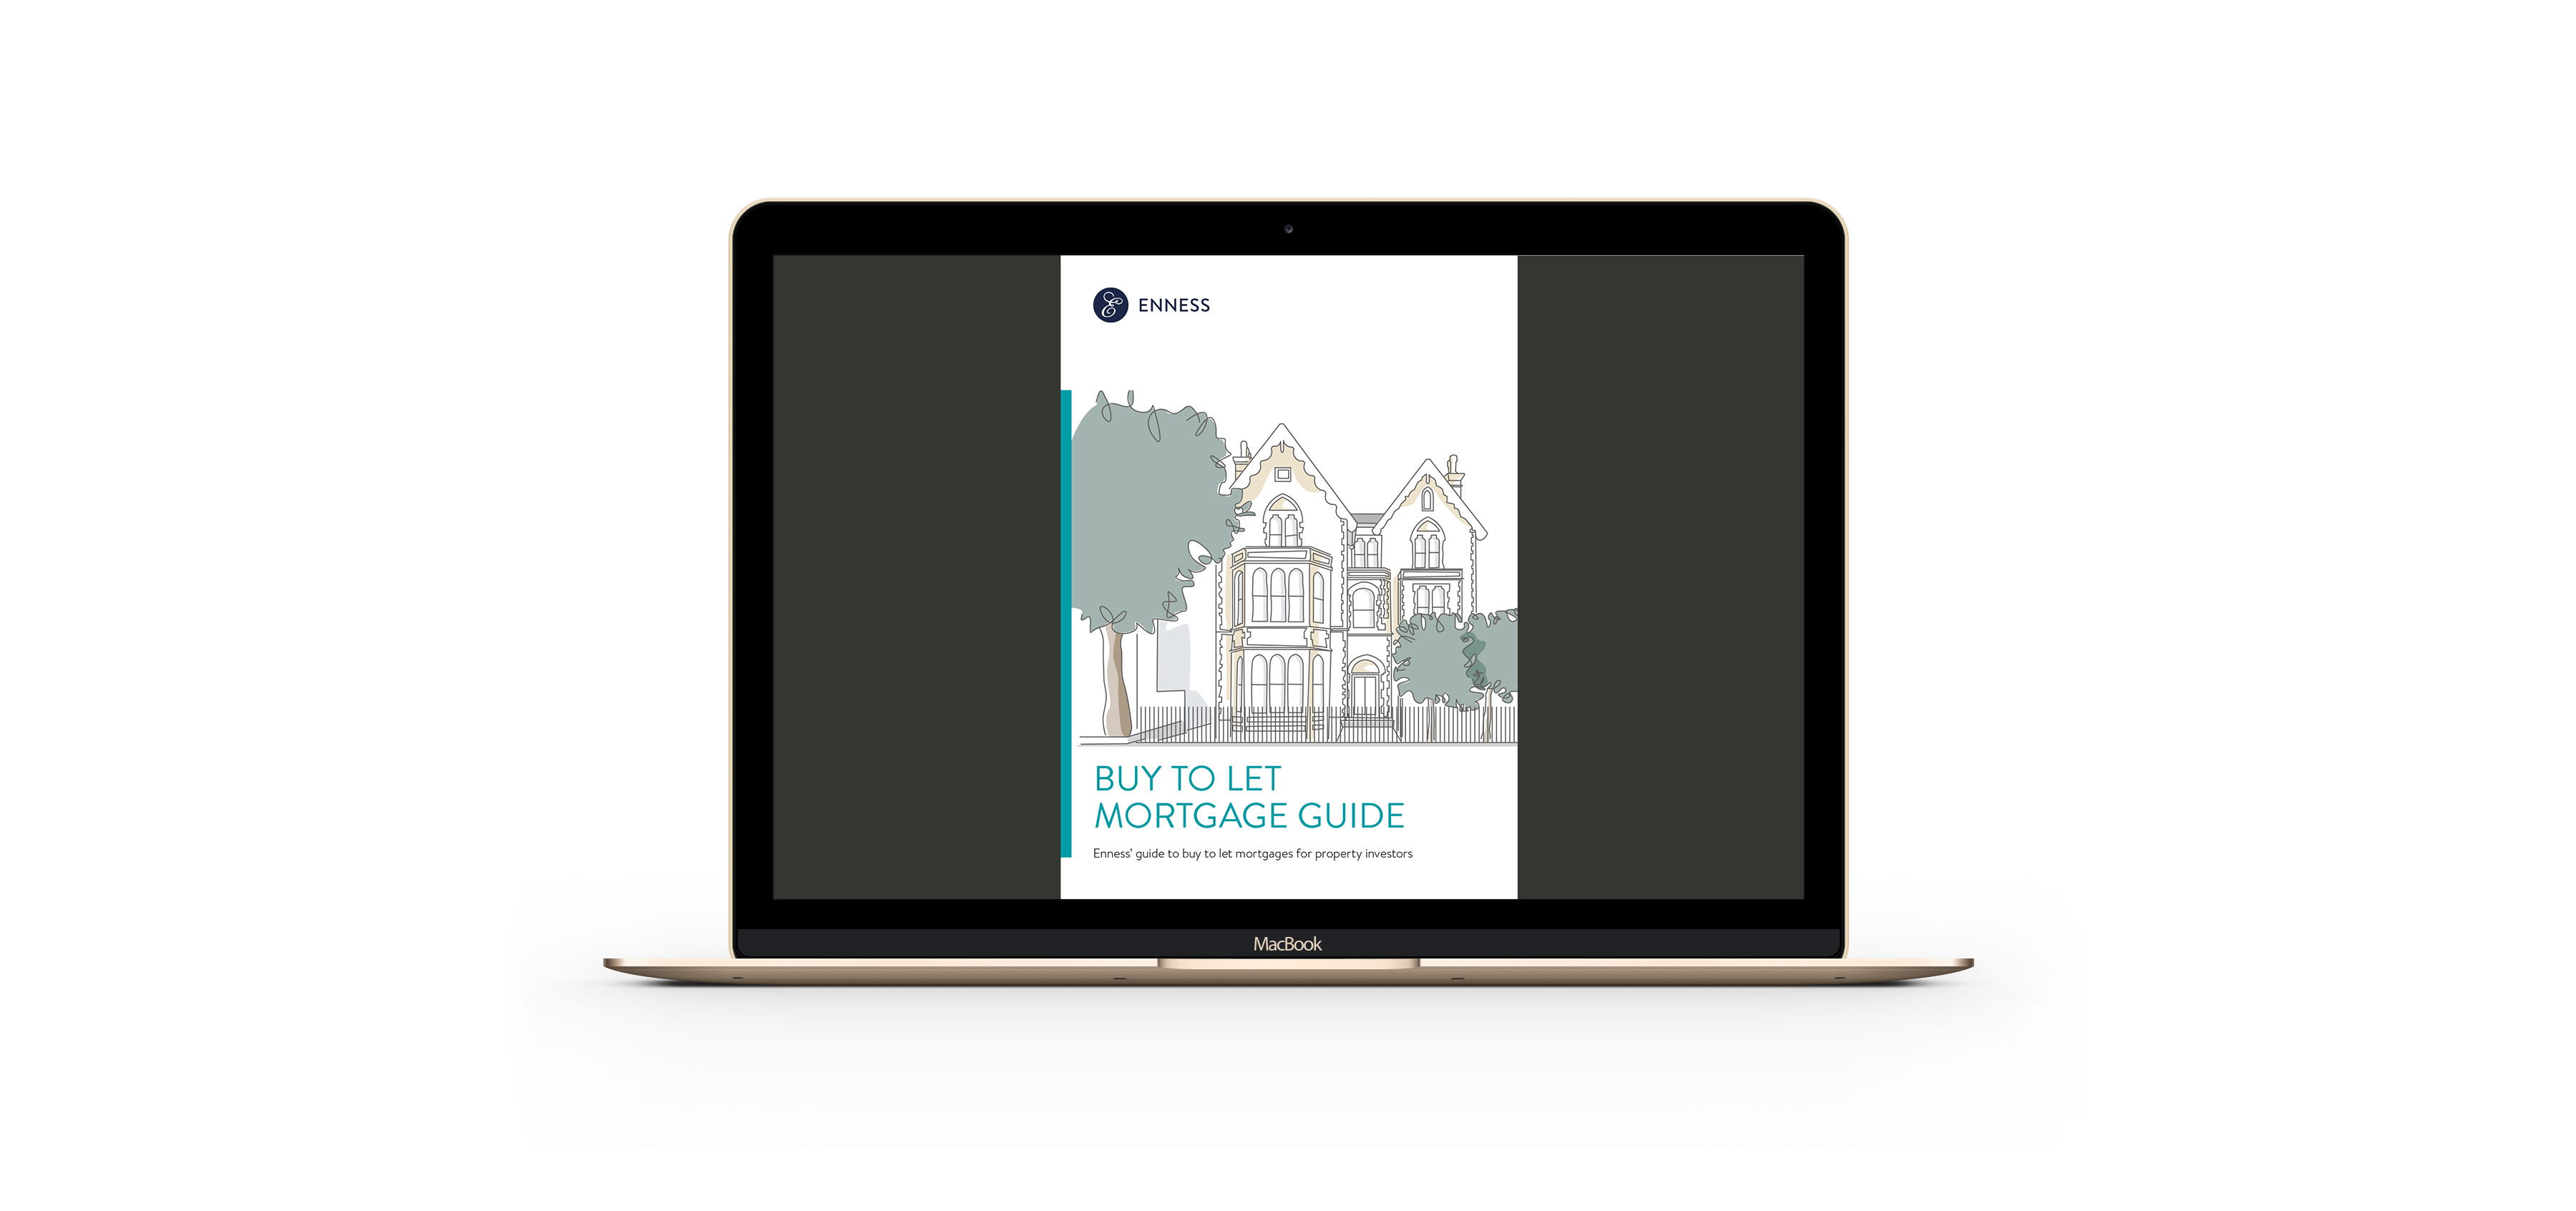 BuyToLet_Guide_ibook.png